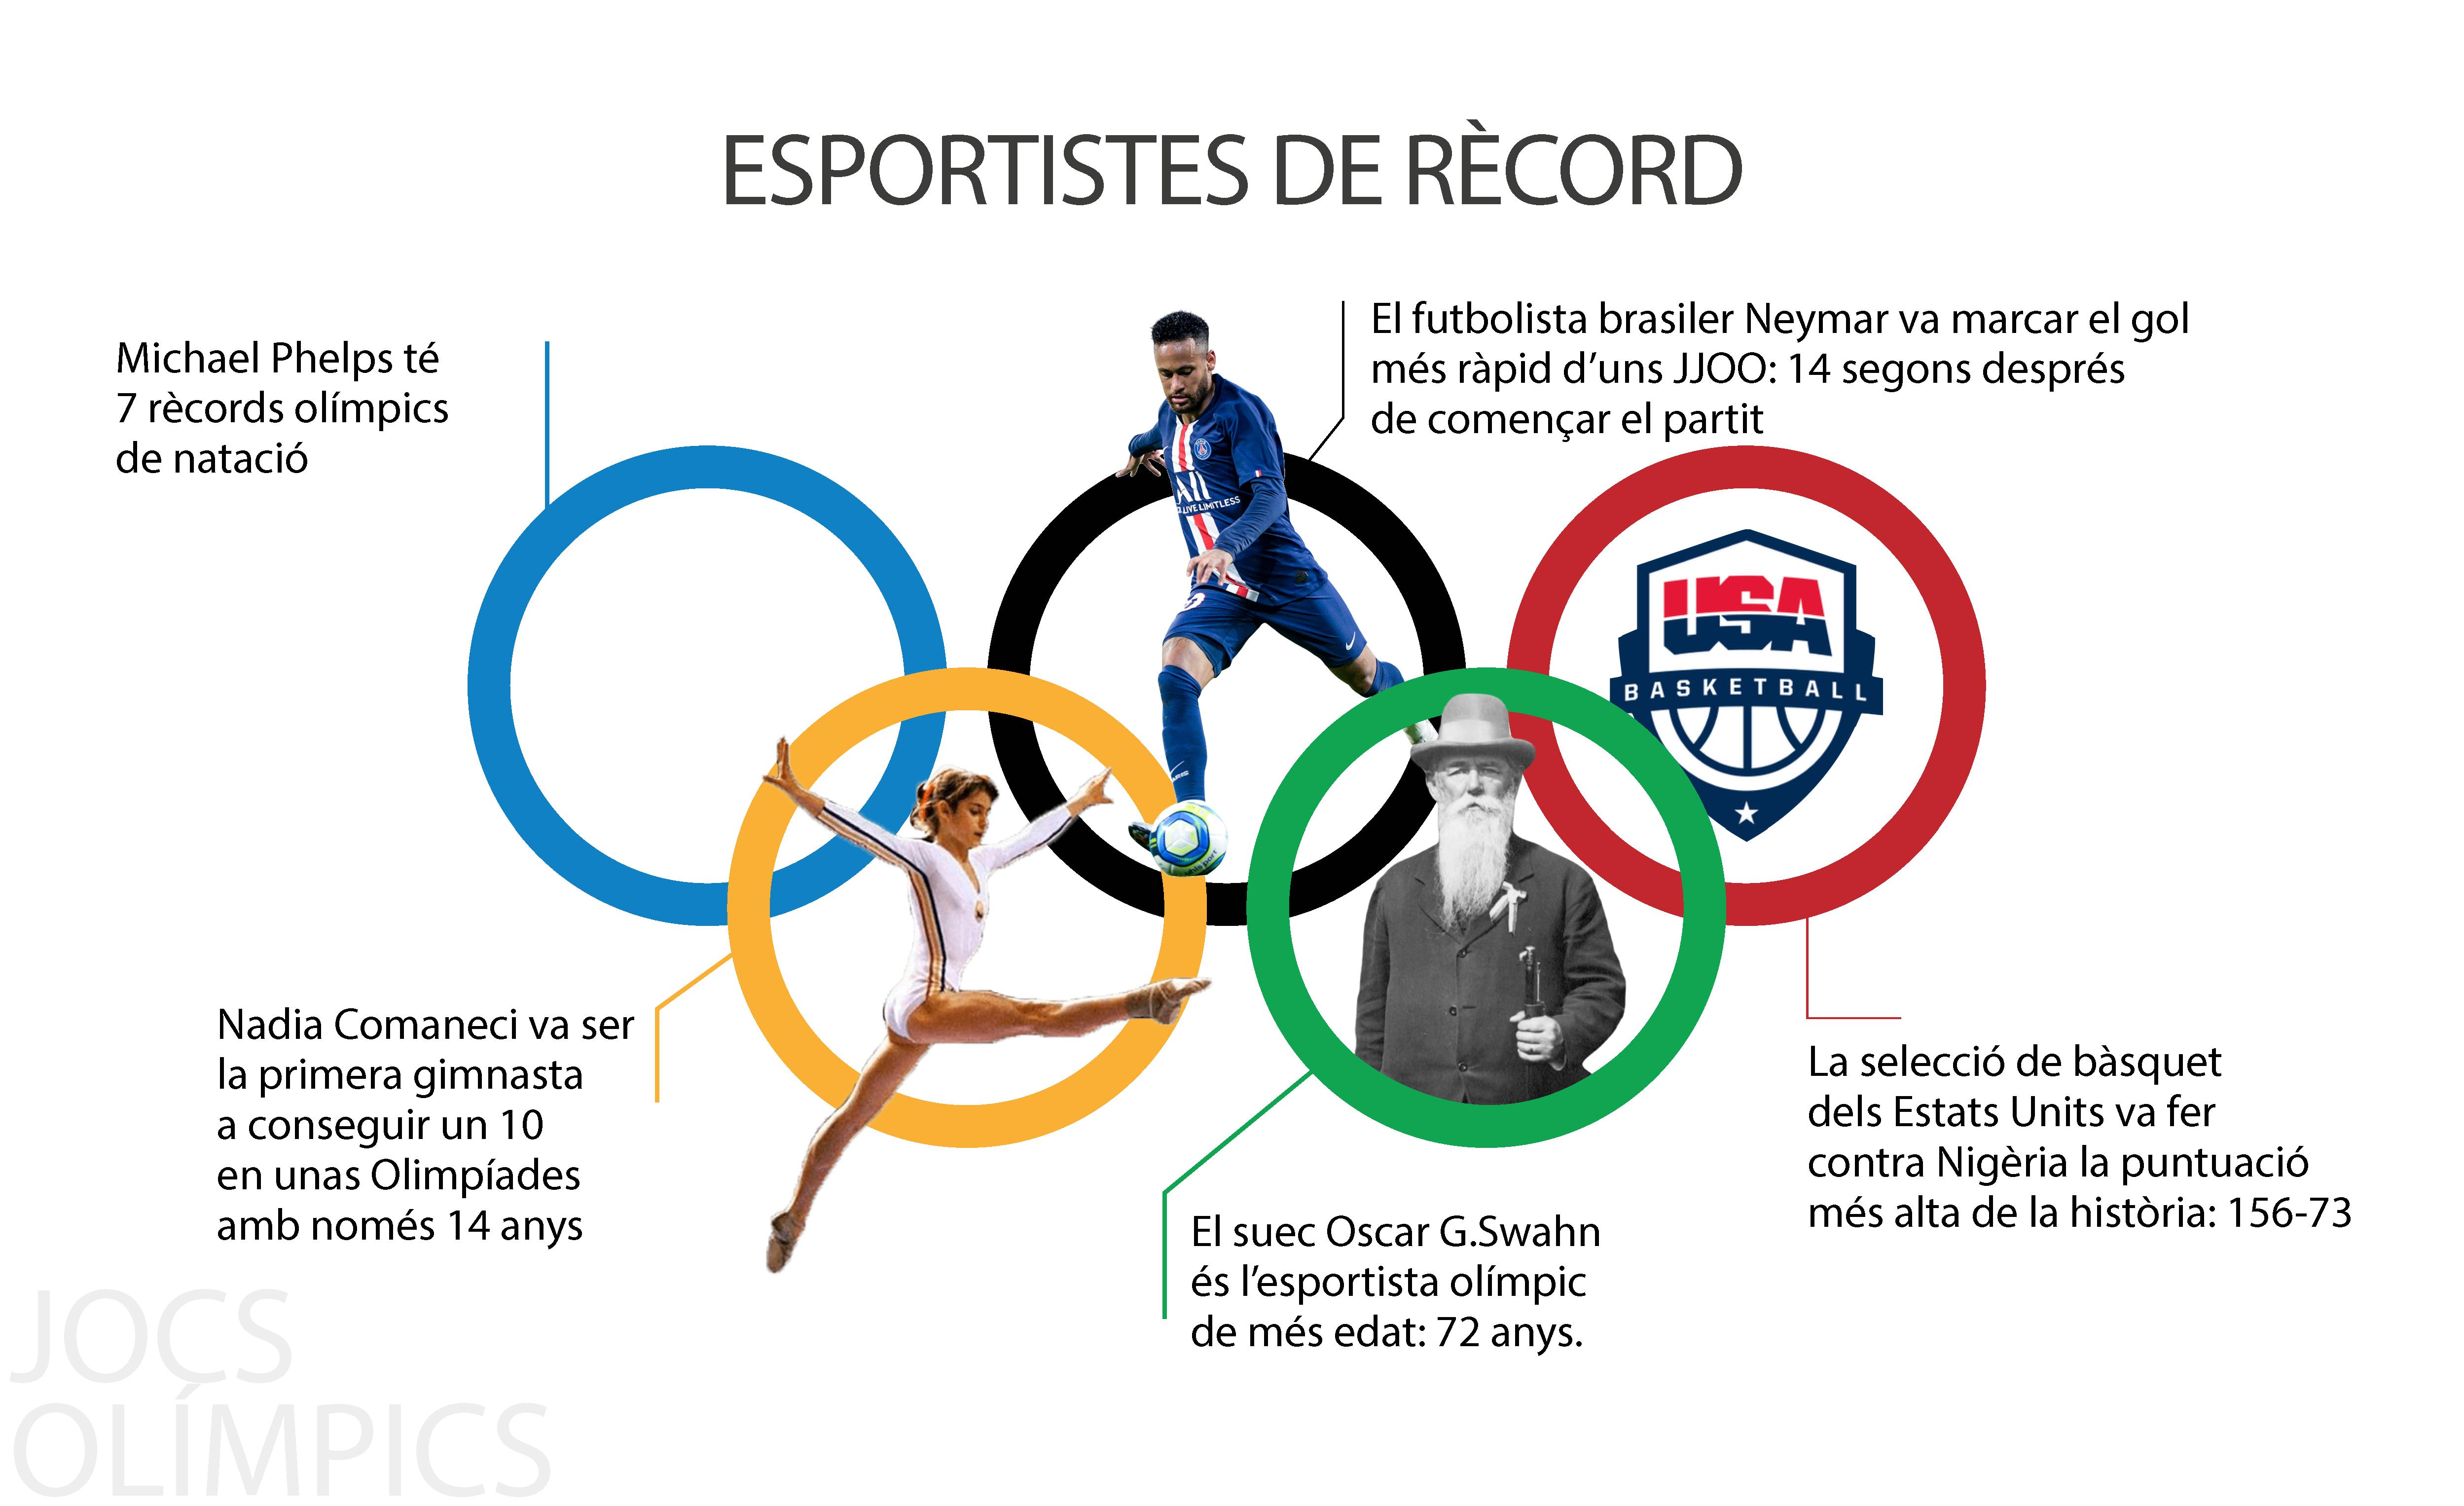 JJOO Rècords Esportistes